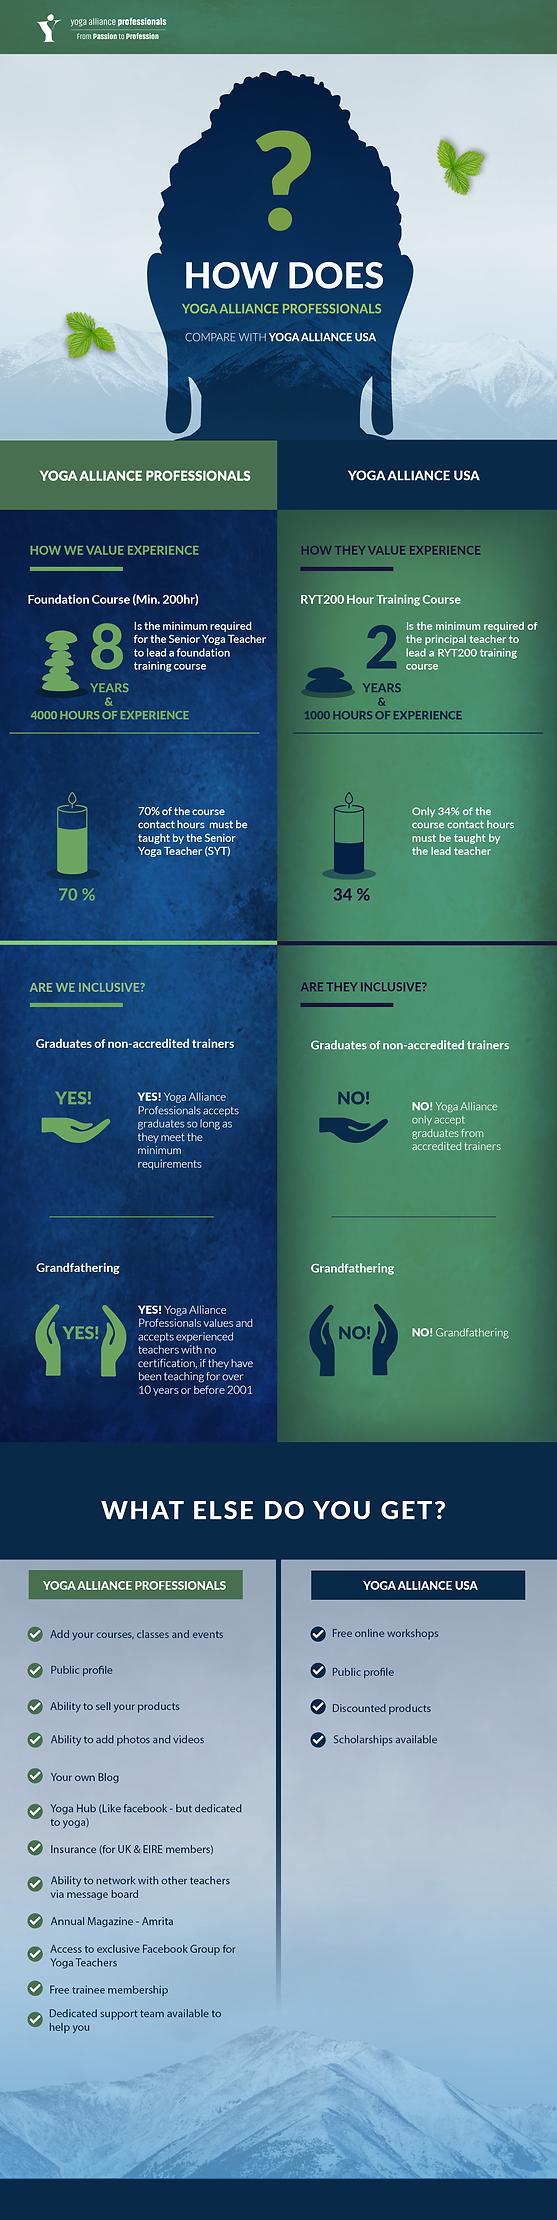 yap vs ya - infographic -1.png